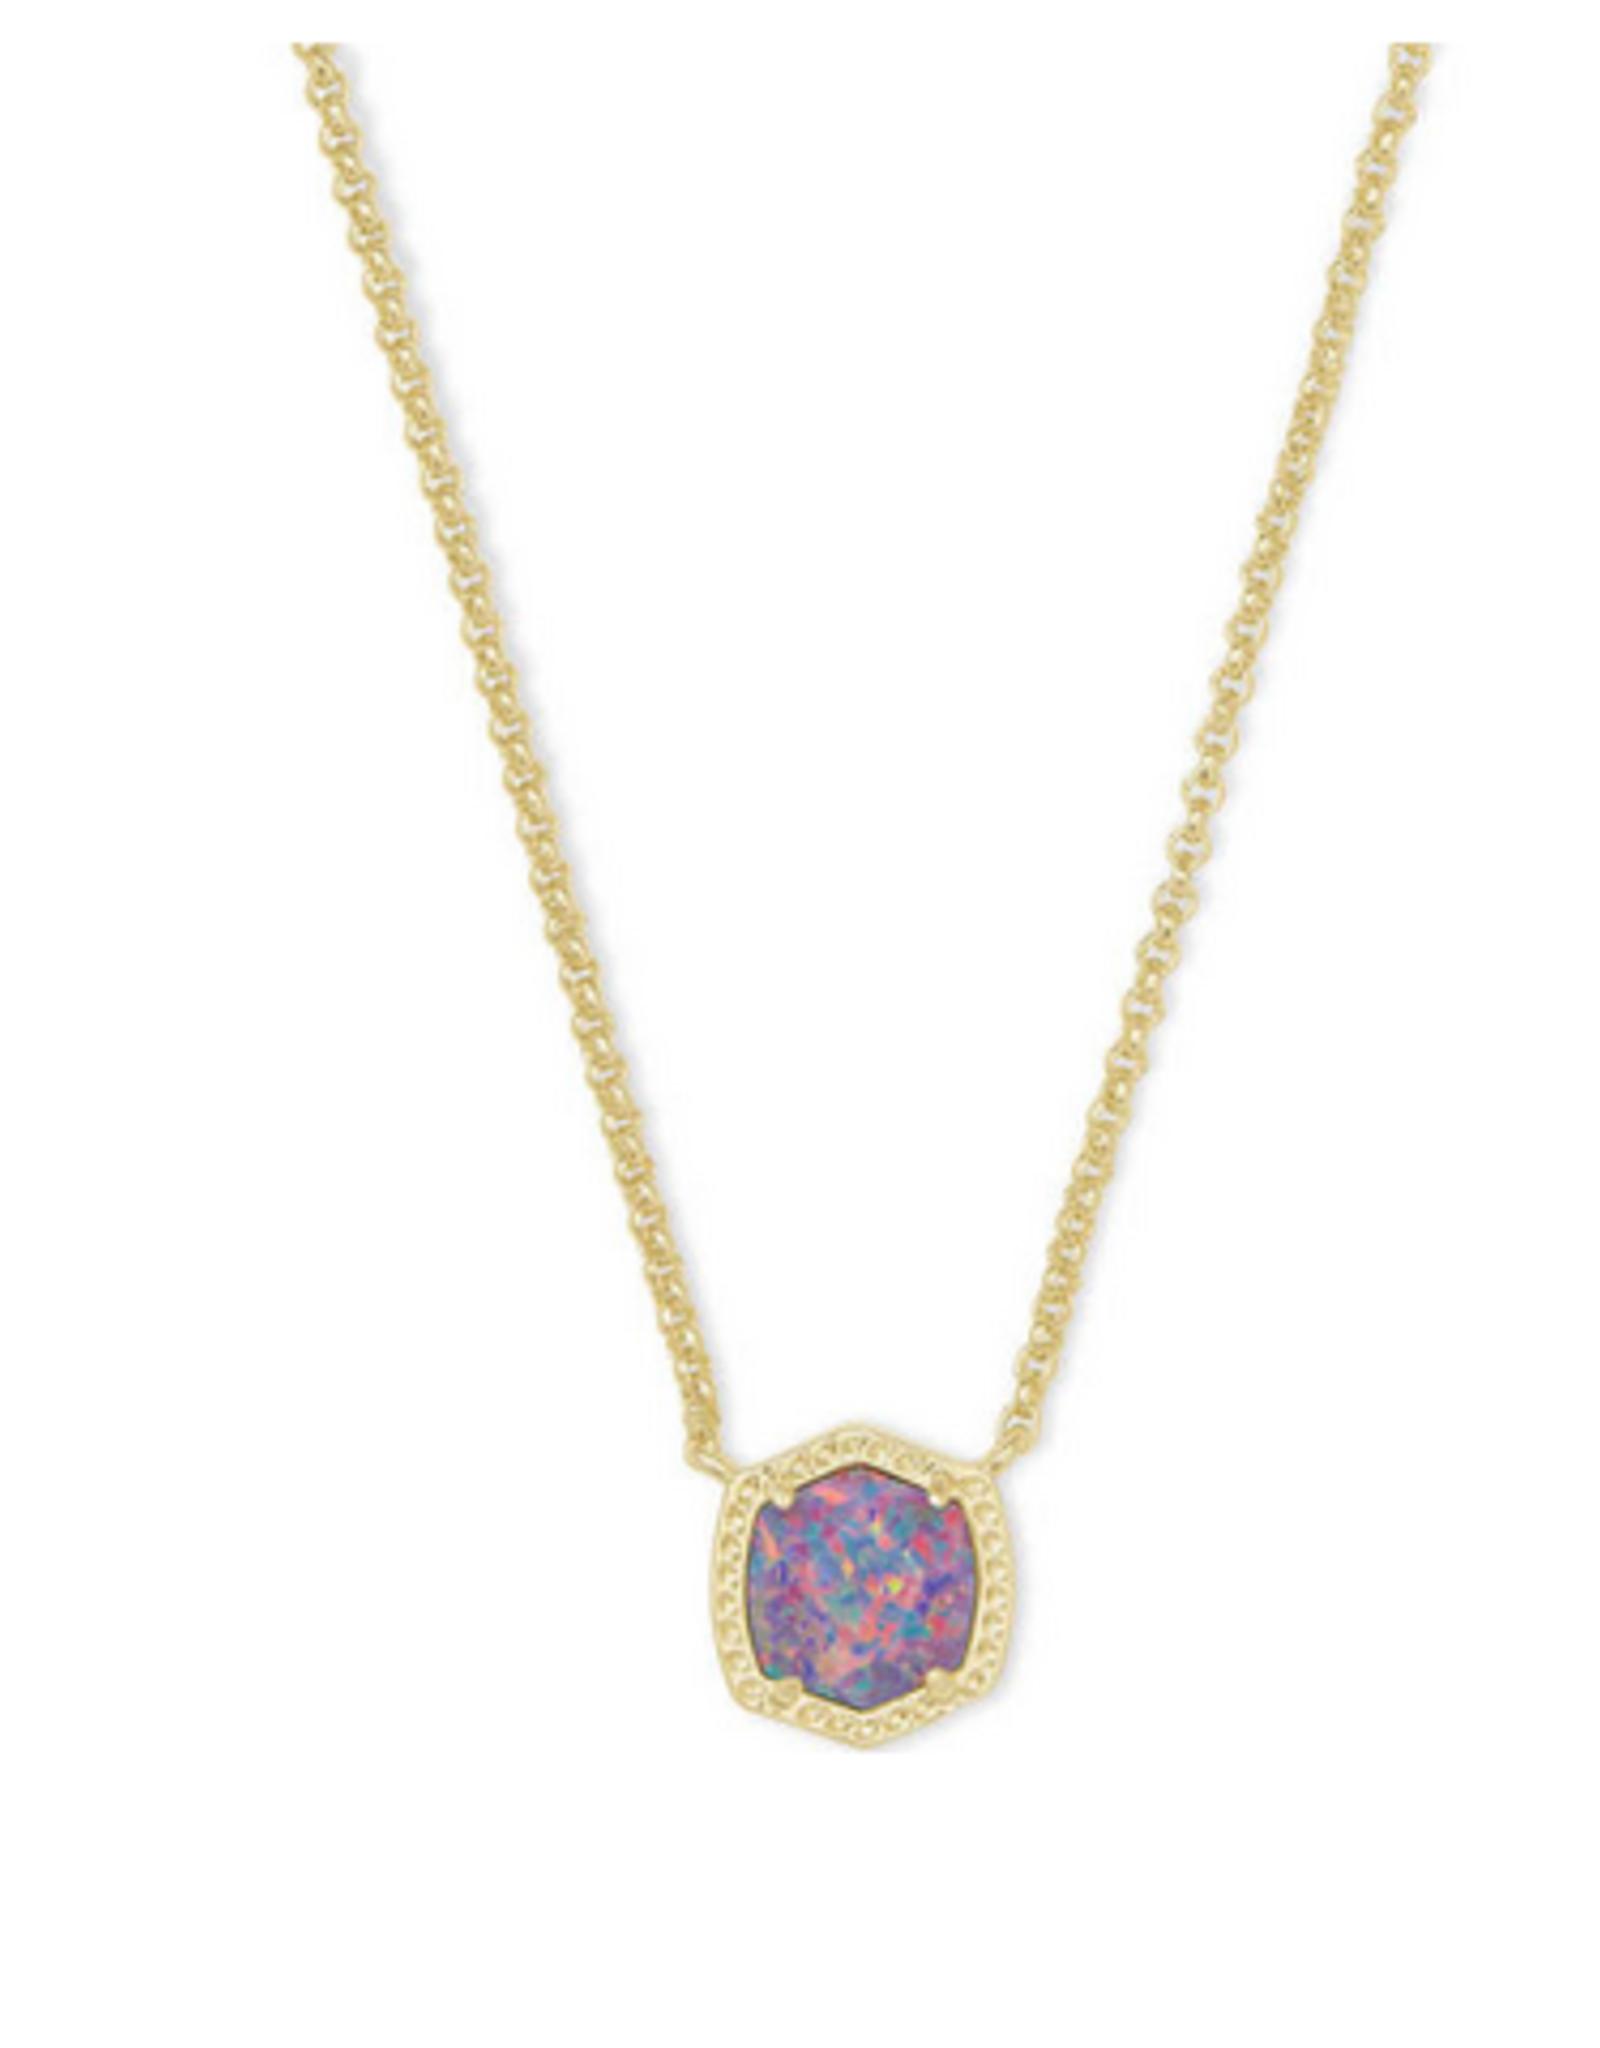 Kendra Scott Kendra Scott Davie Short Pendant Necklace Gold/Lavender Opal